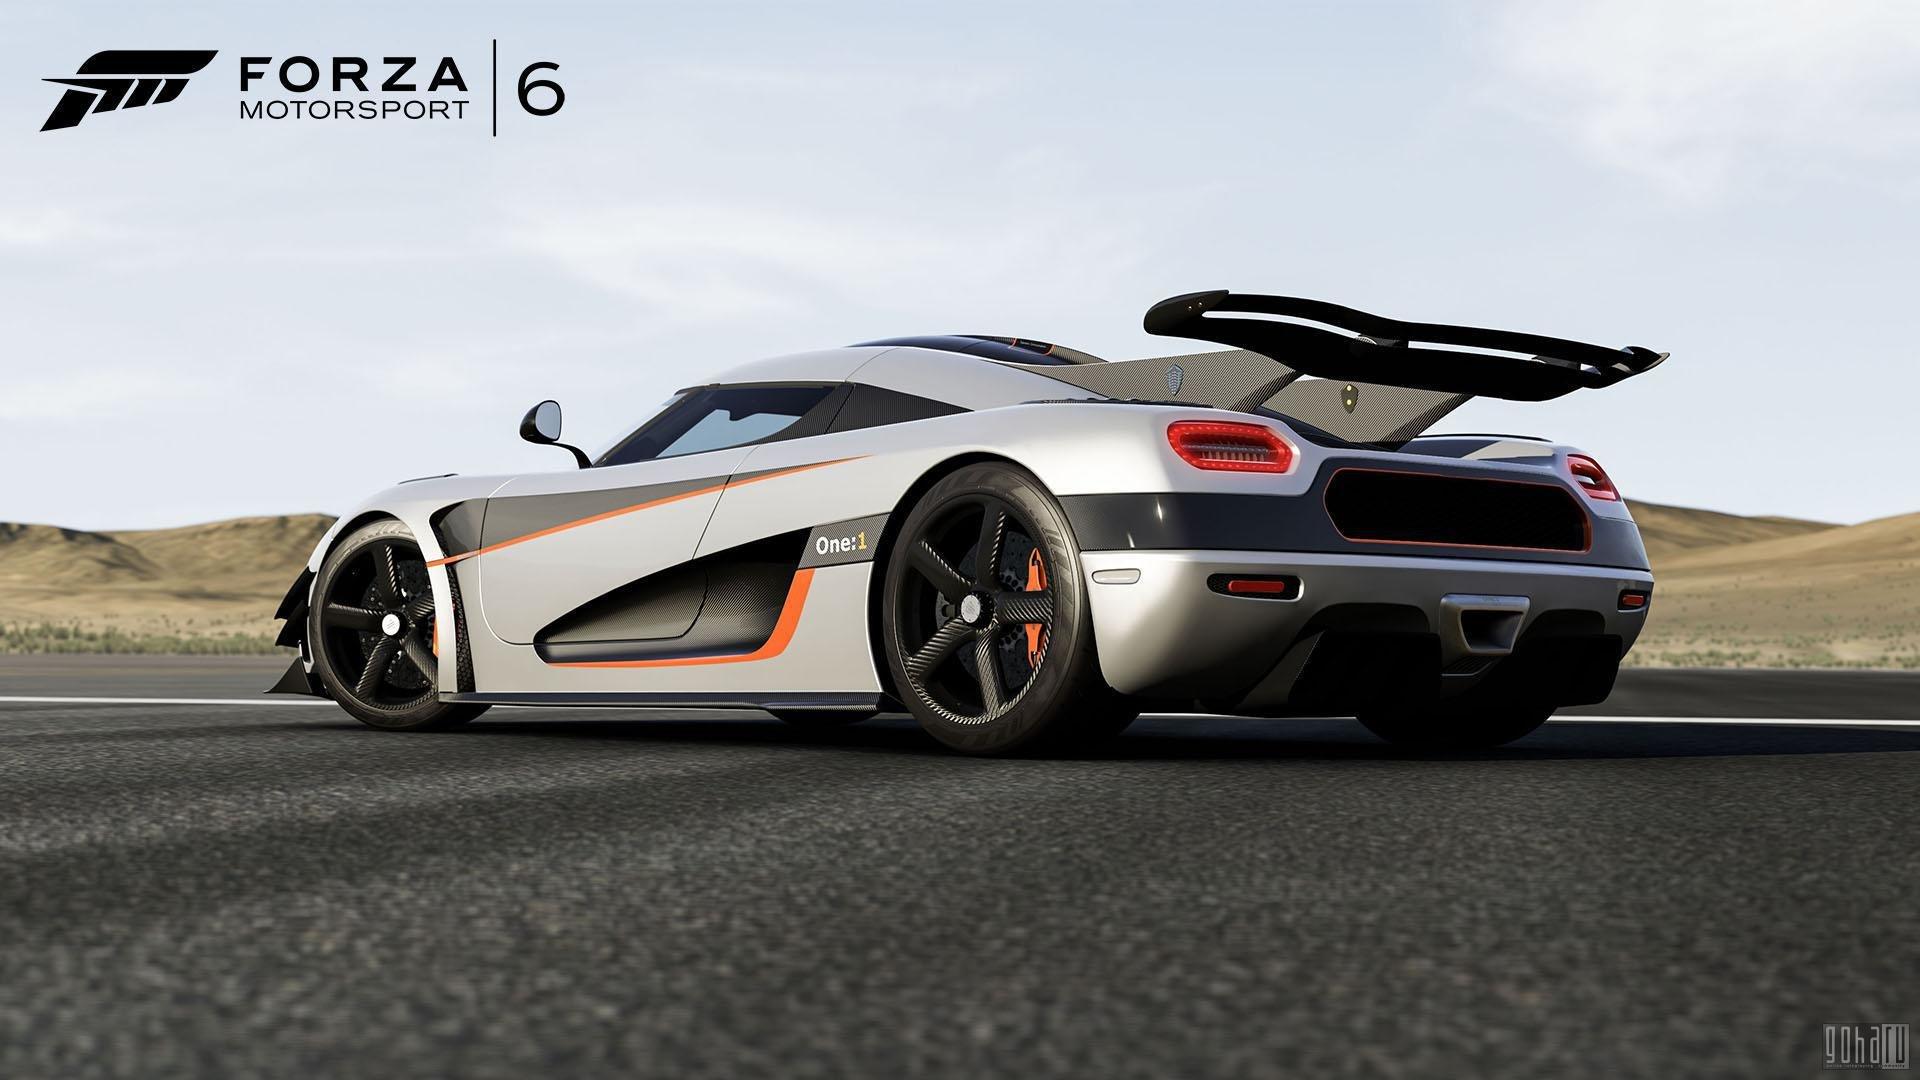 Free Download Forza Motorsport 6 Background Id Forza Motorsport 6 1920x1080 Wallpaper Teahub Io